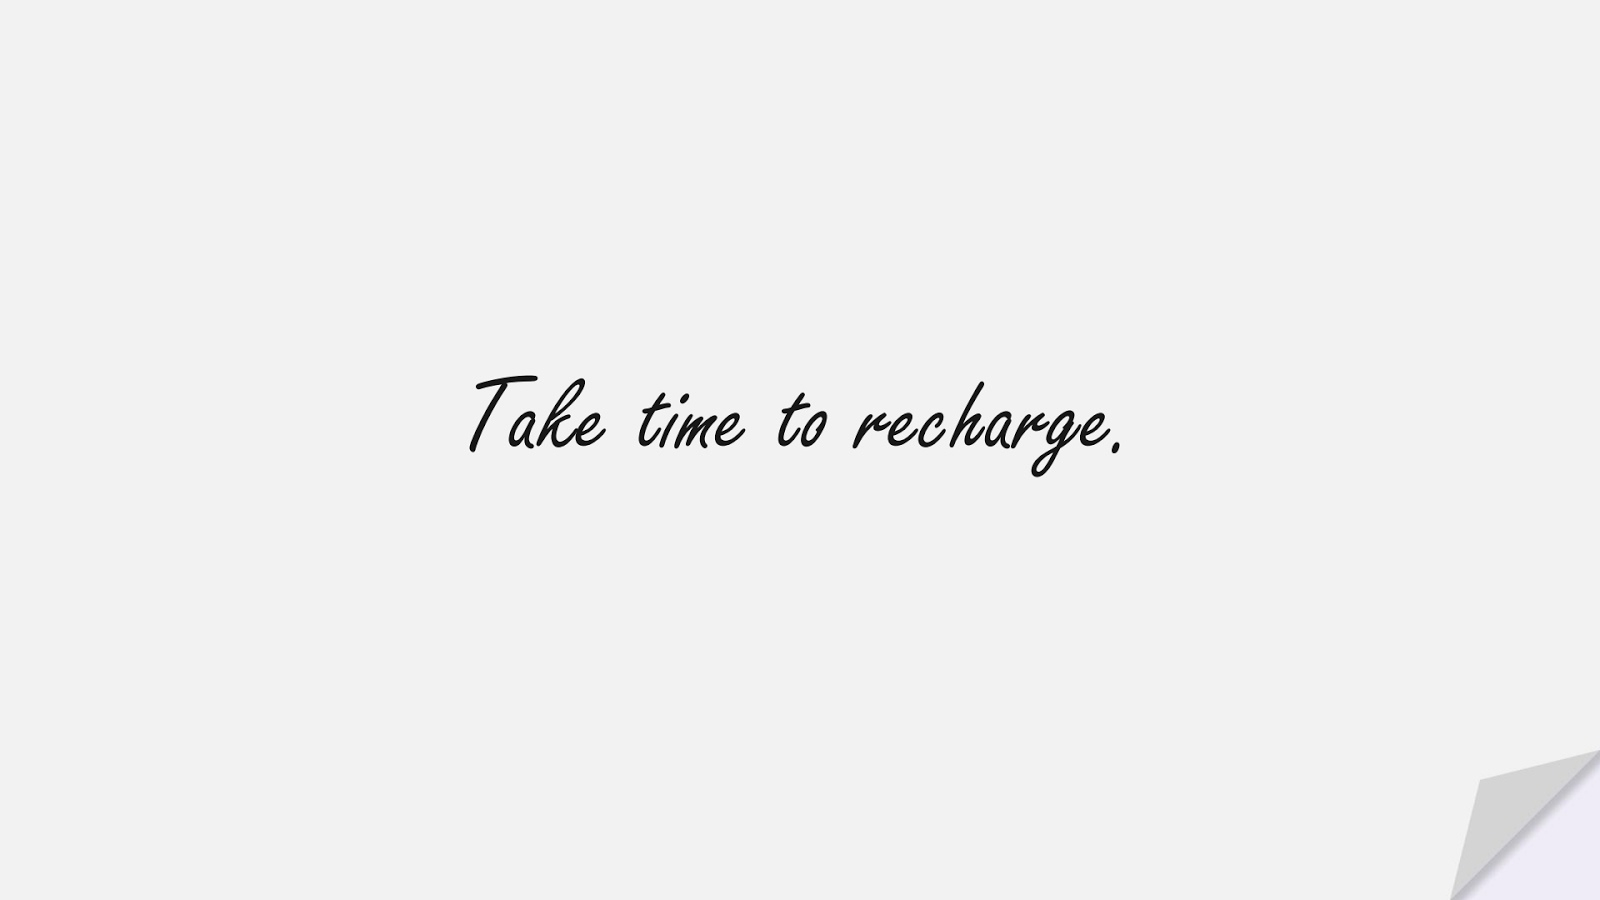 Take time to recharge.FALSE